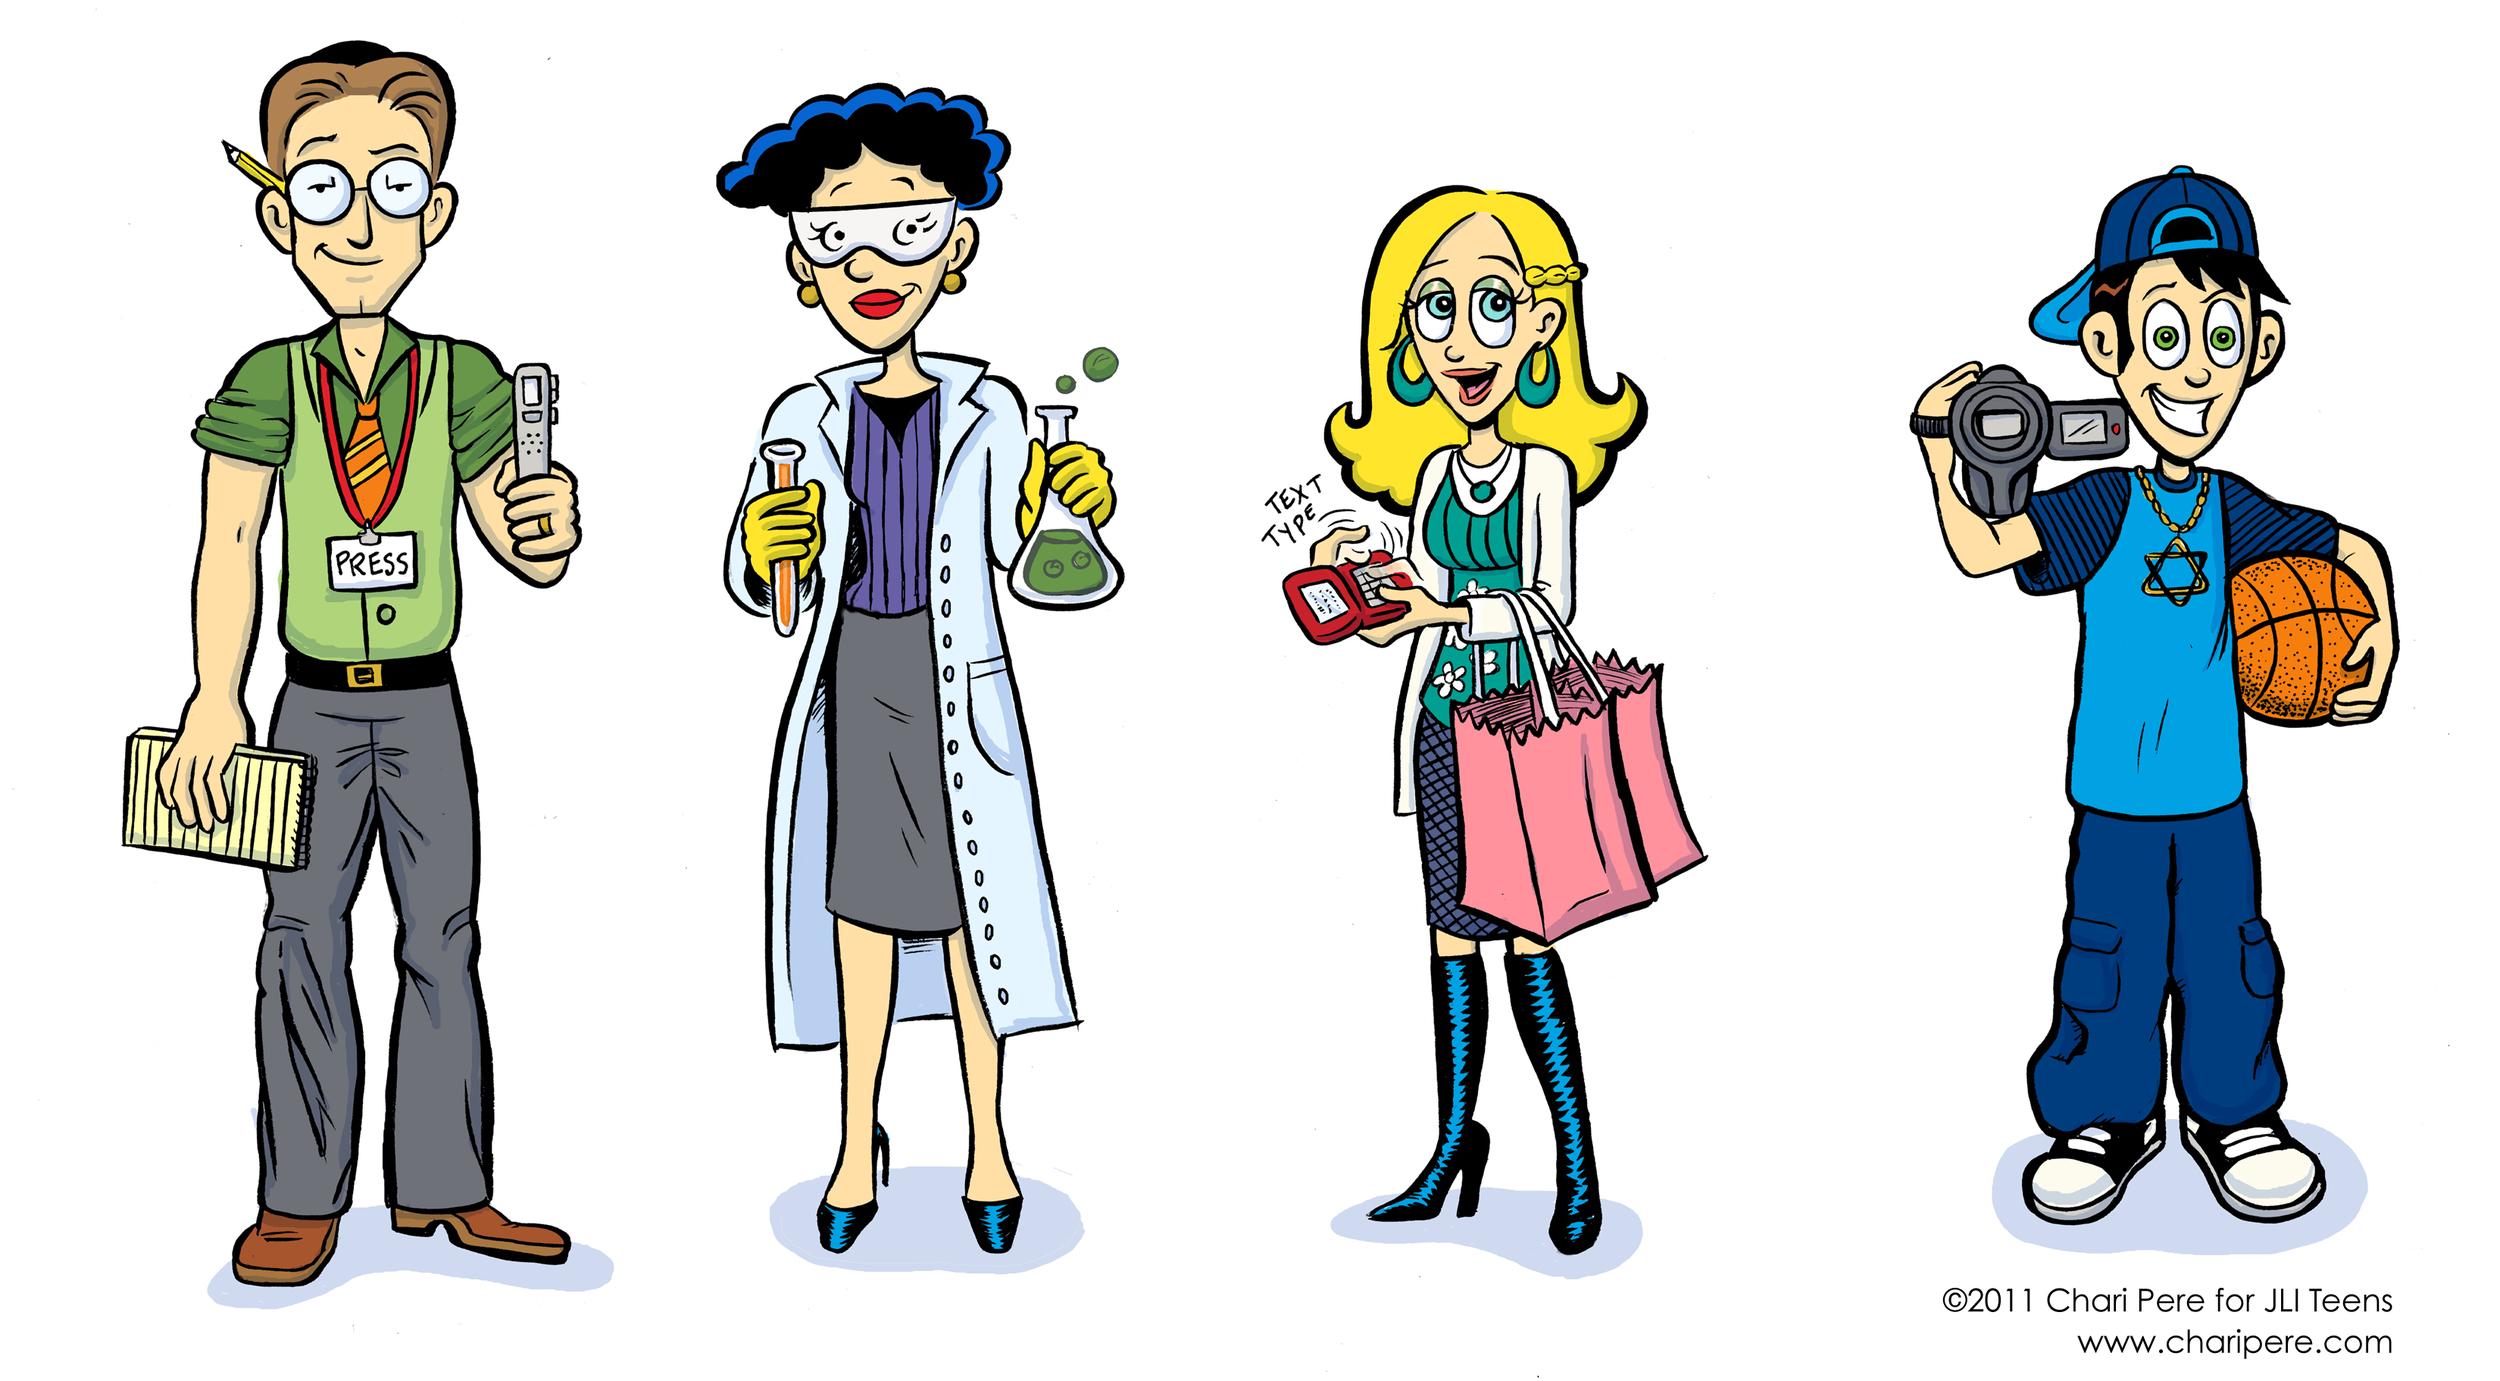 Character Designs for JLI Teens